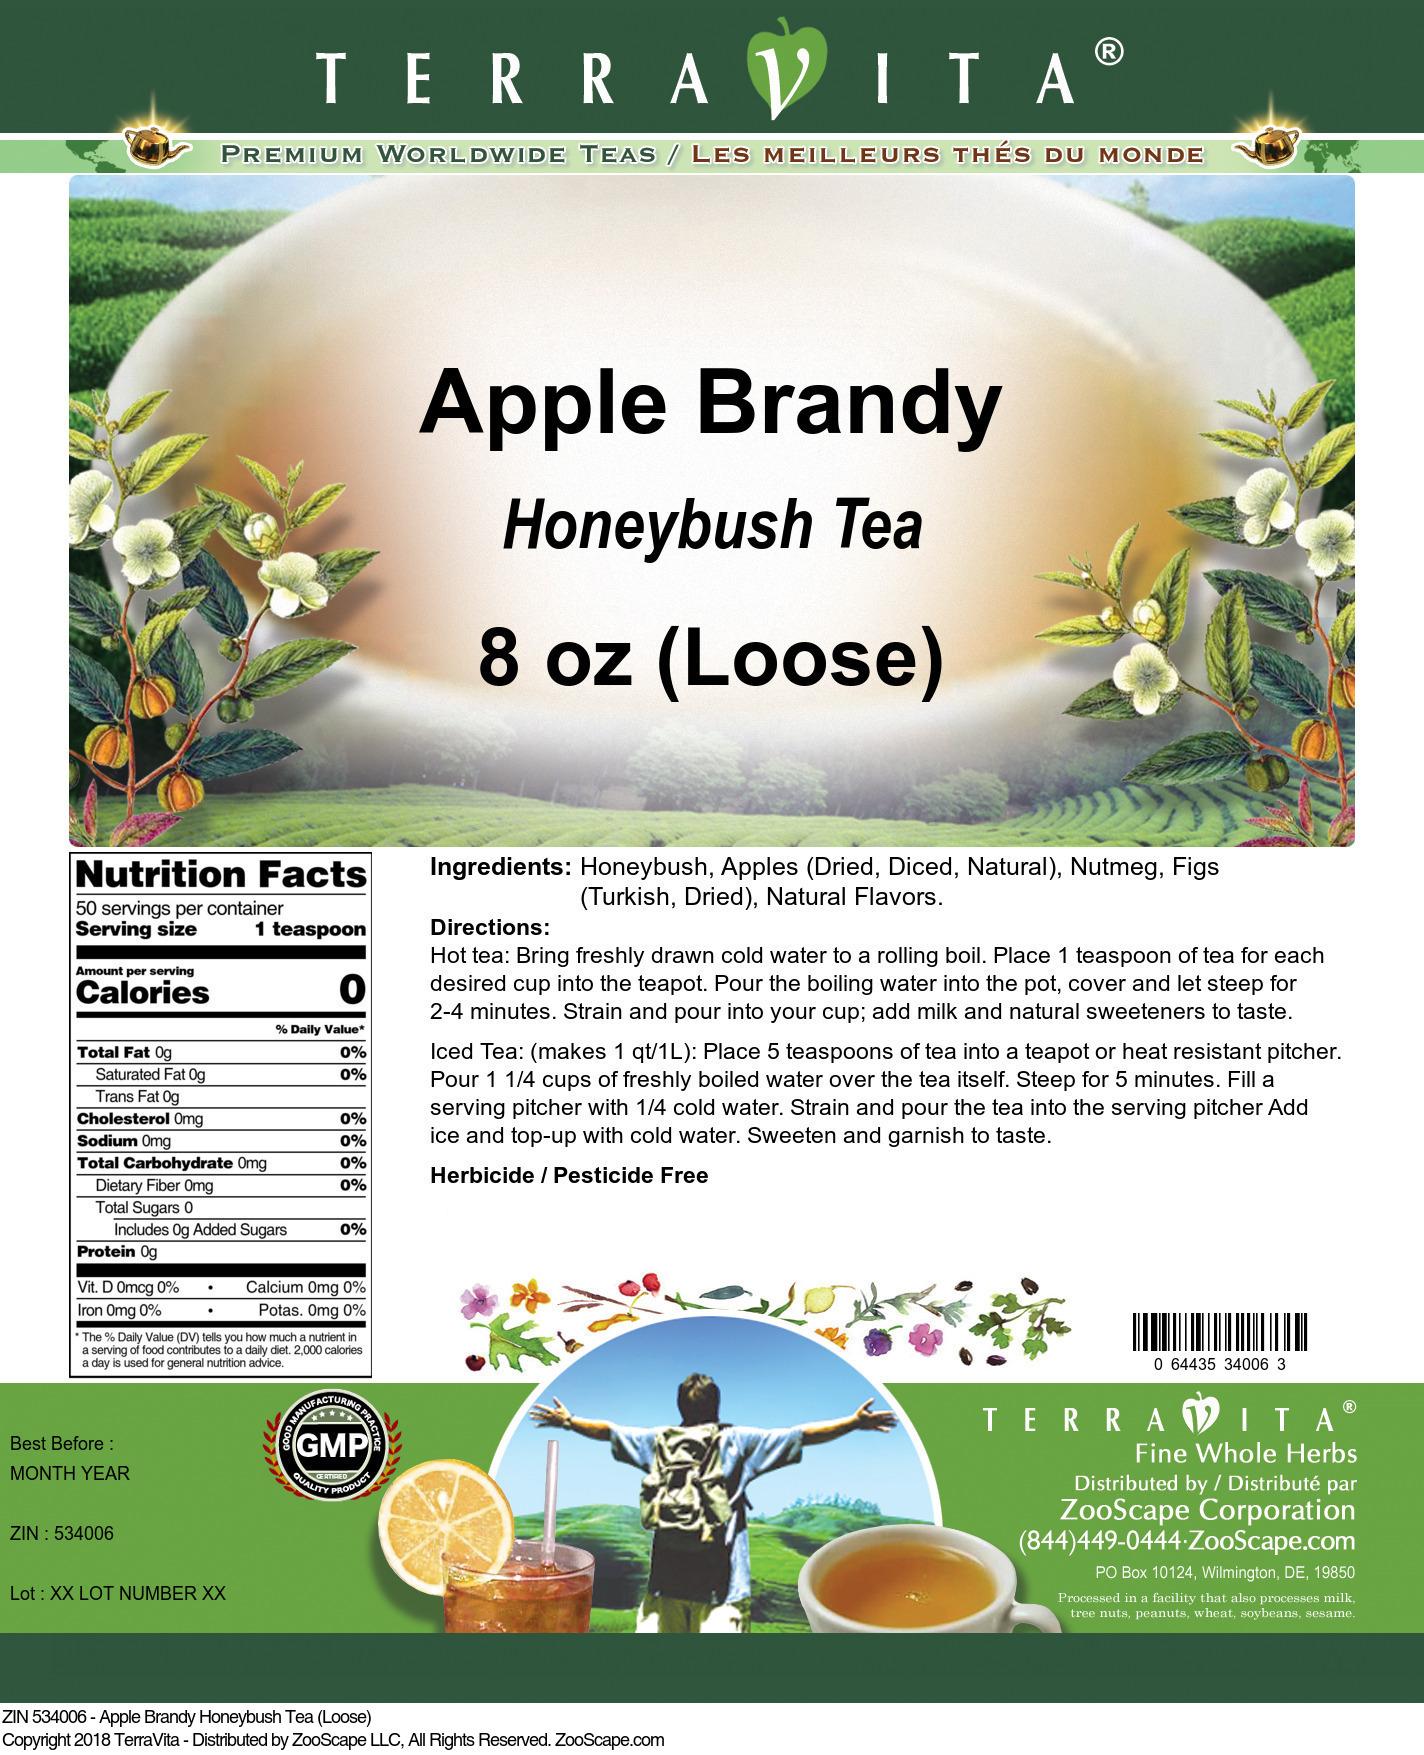 Apple Brandy Honeybush Tea (Loose)